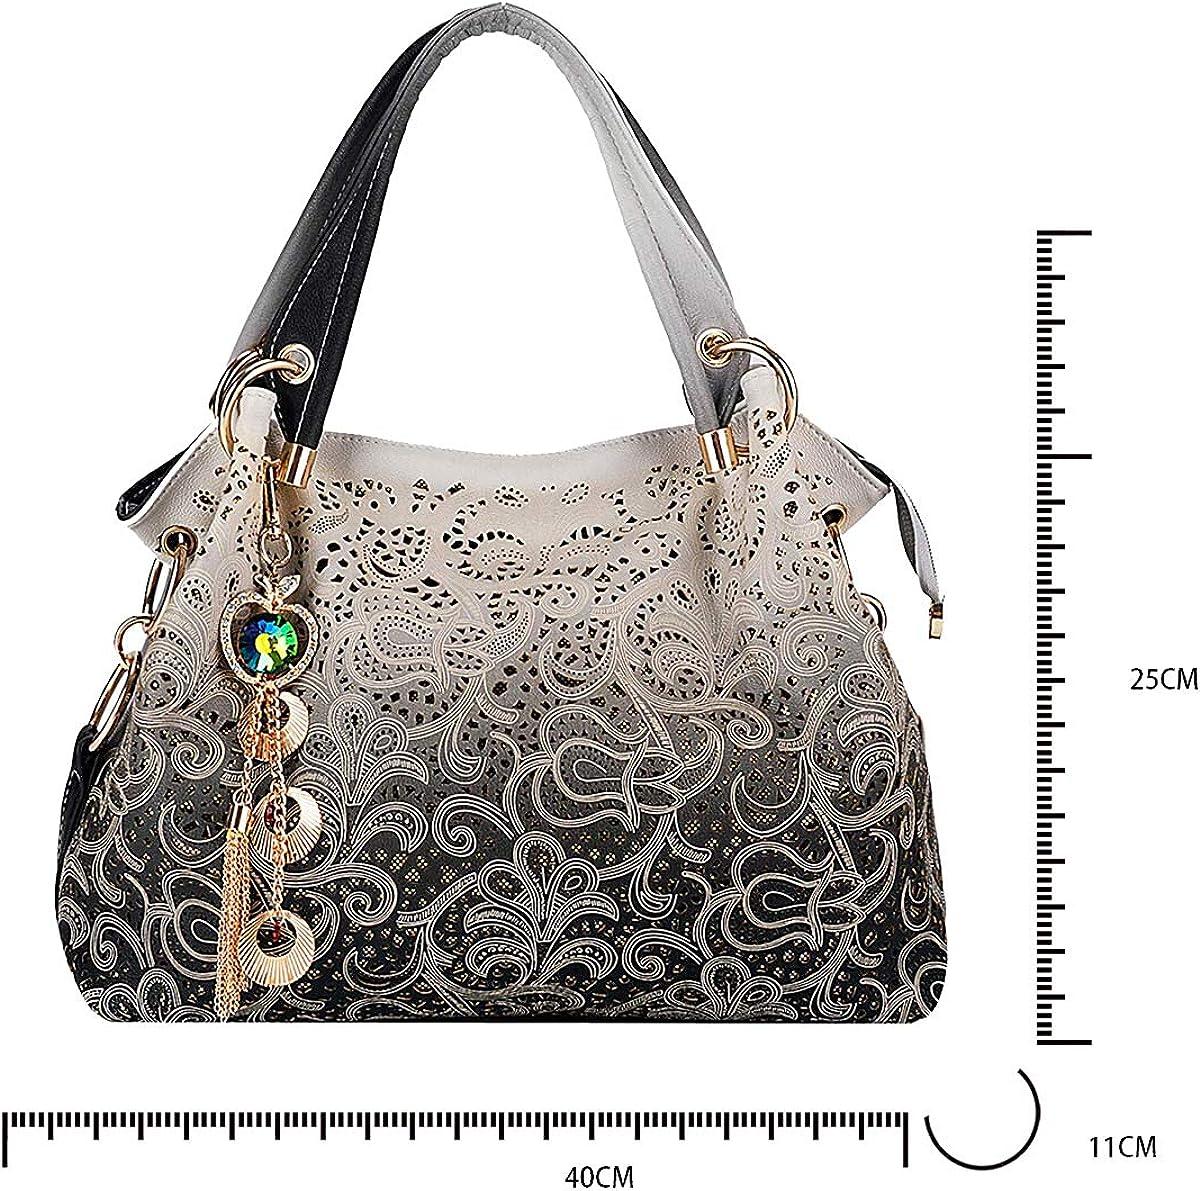 Tisdaini Womens Handbags Fashion High capacity Shoulder Bags Cross-Body Top-Handle Totes UK906 Black